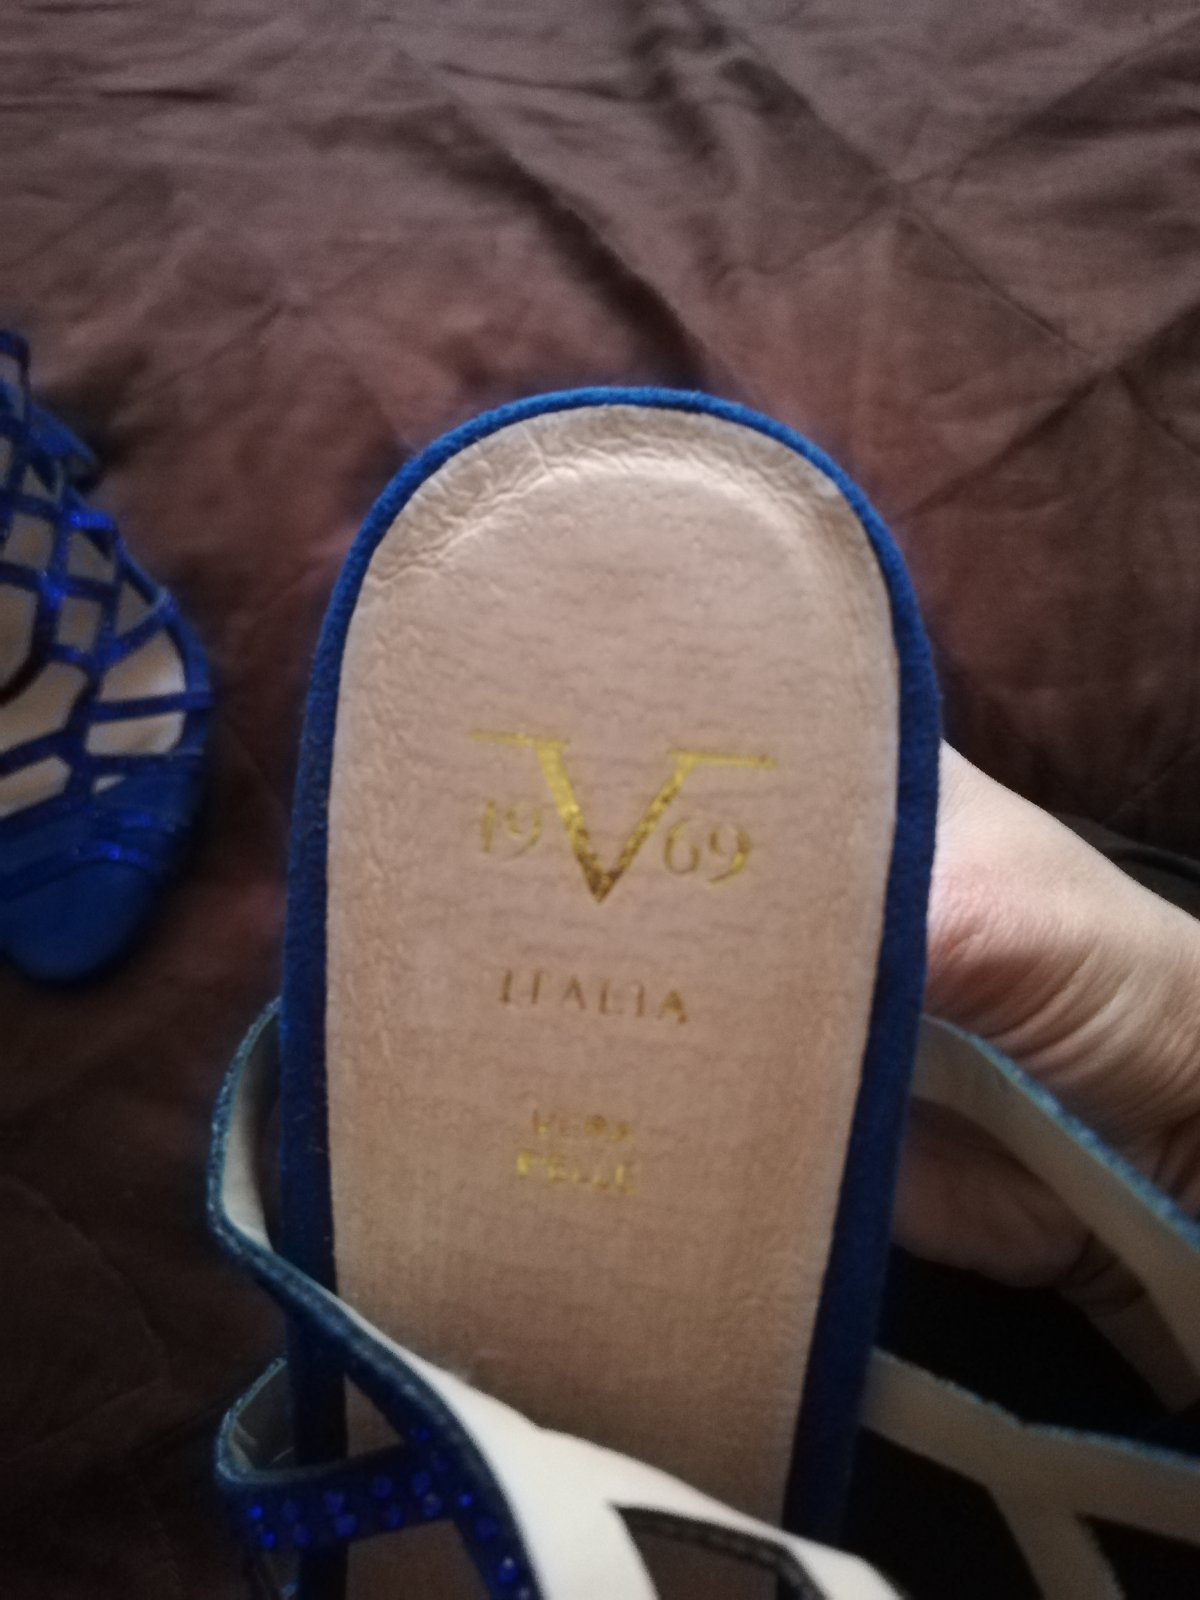 Sandalky kralovska modra - Obrázok č. 4